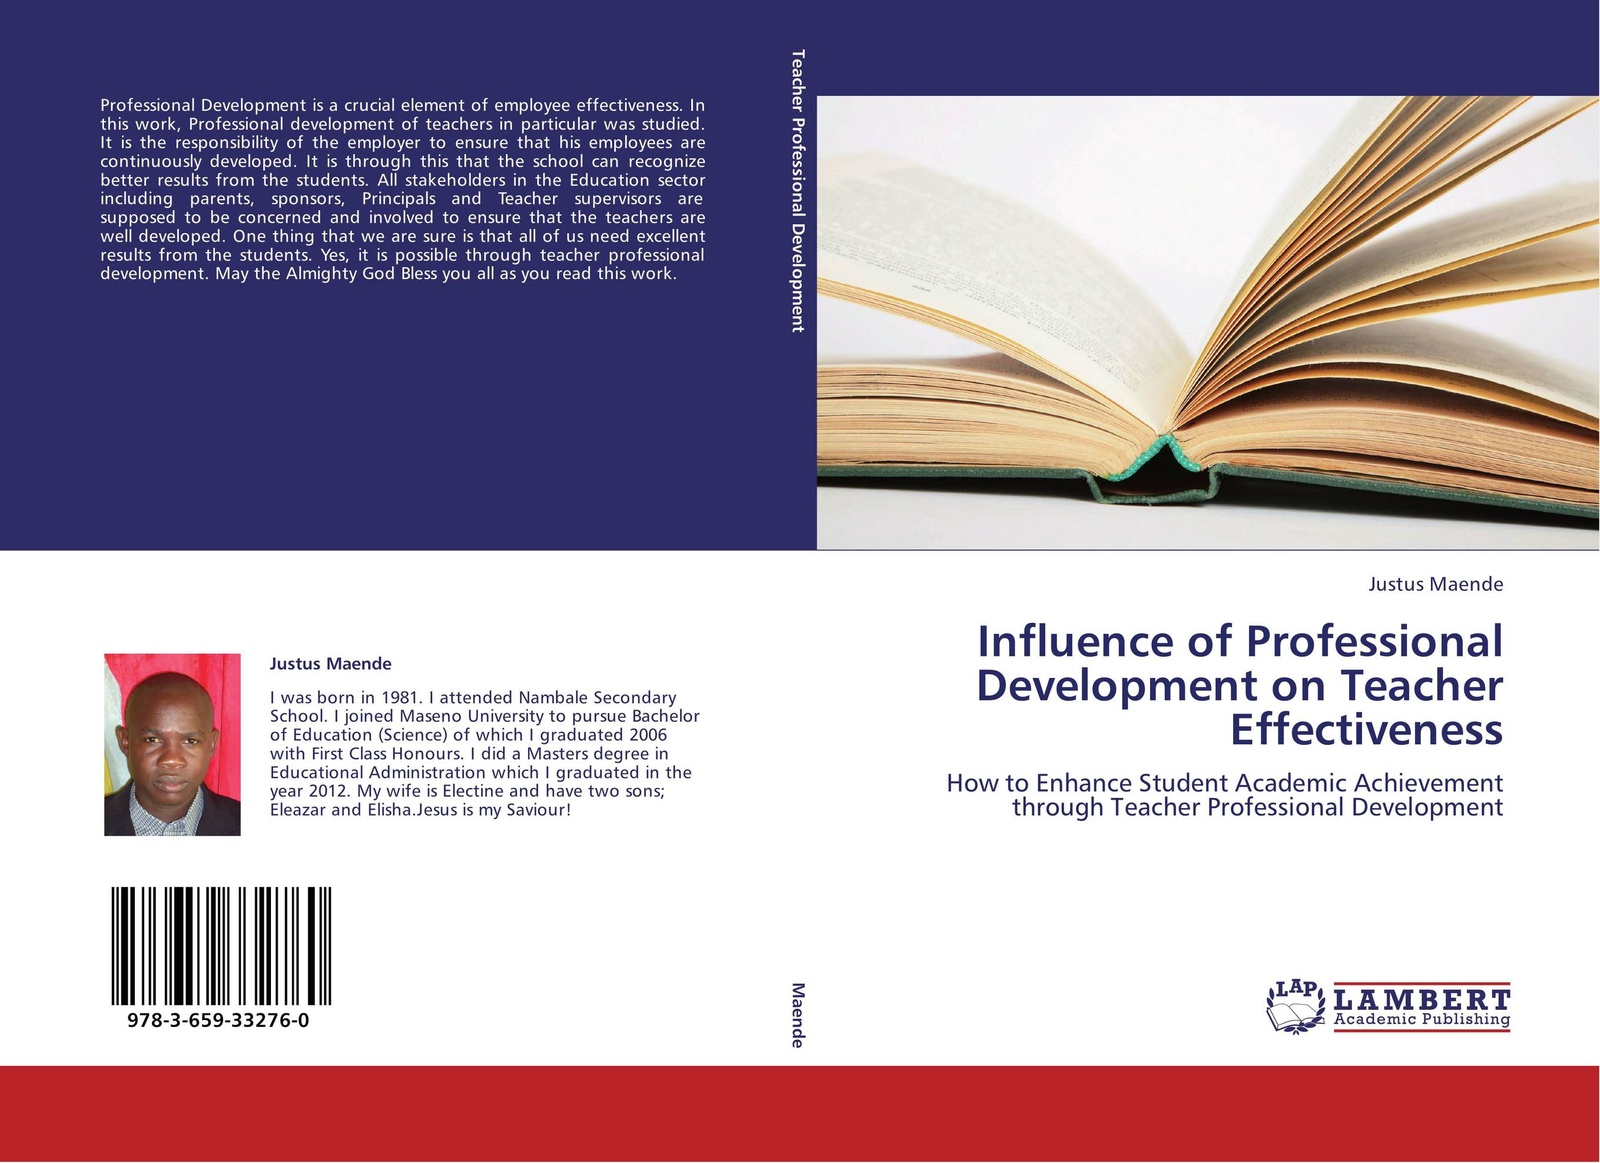 Фото - Justus Maende Influence of Professional Development on Teacher Effectiveness the influence of head teacher evaluation on their professional growth